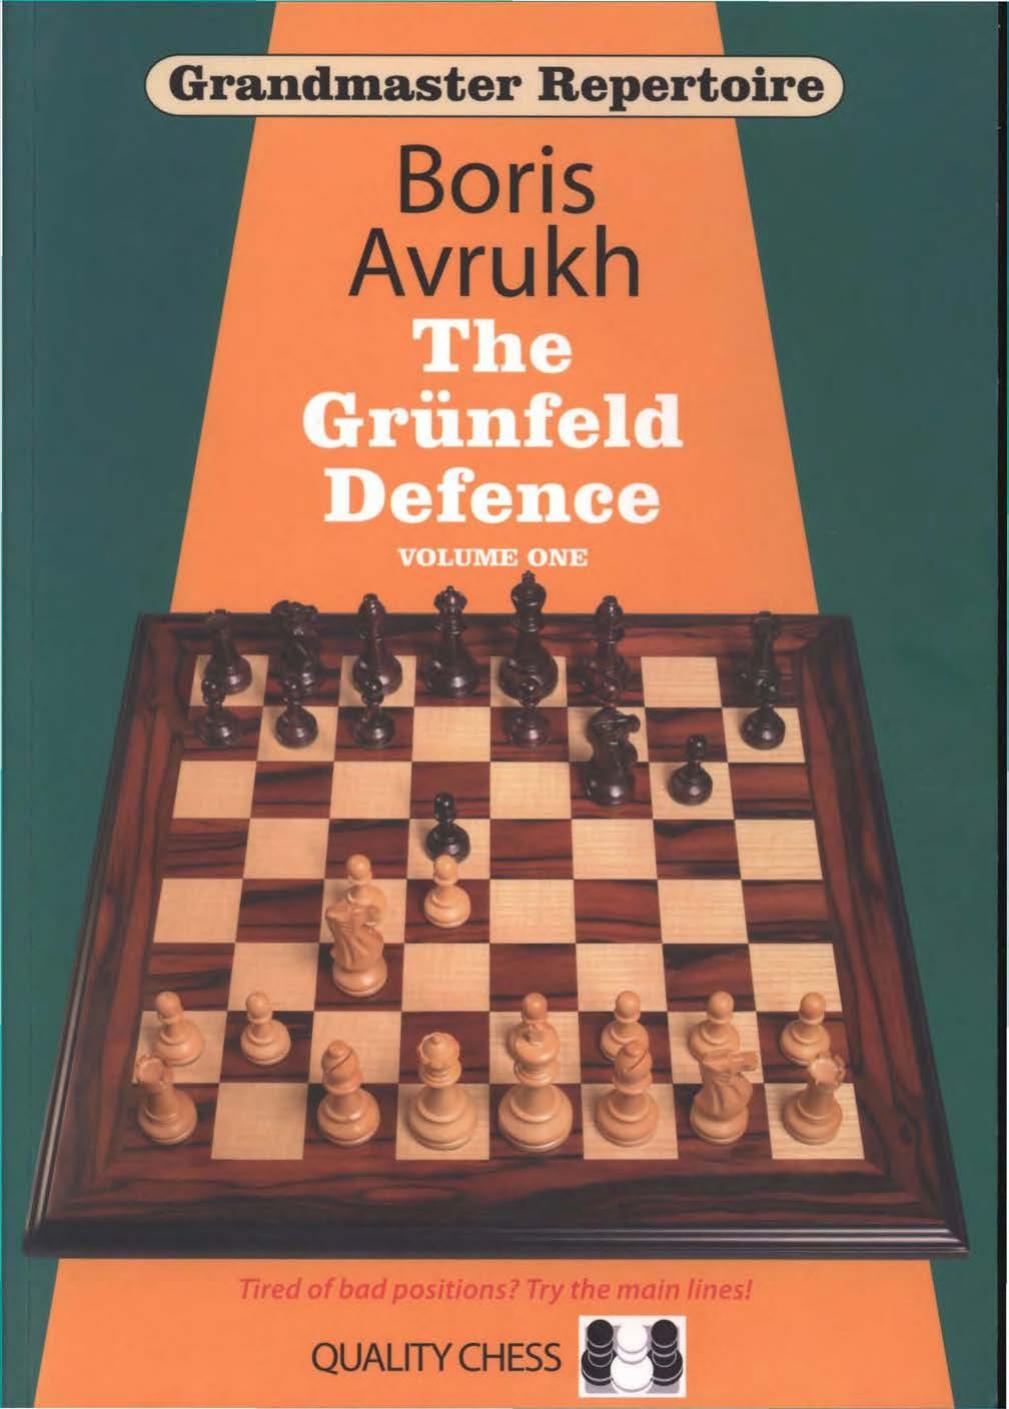 Grandmaster Repertoire 8 Grunfeld vol 1